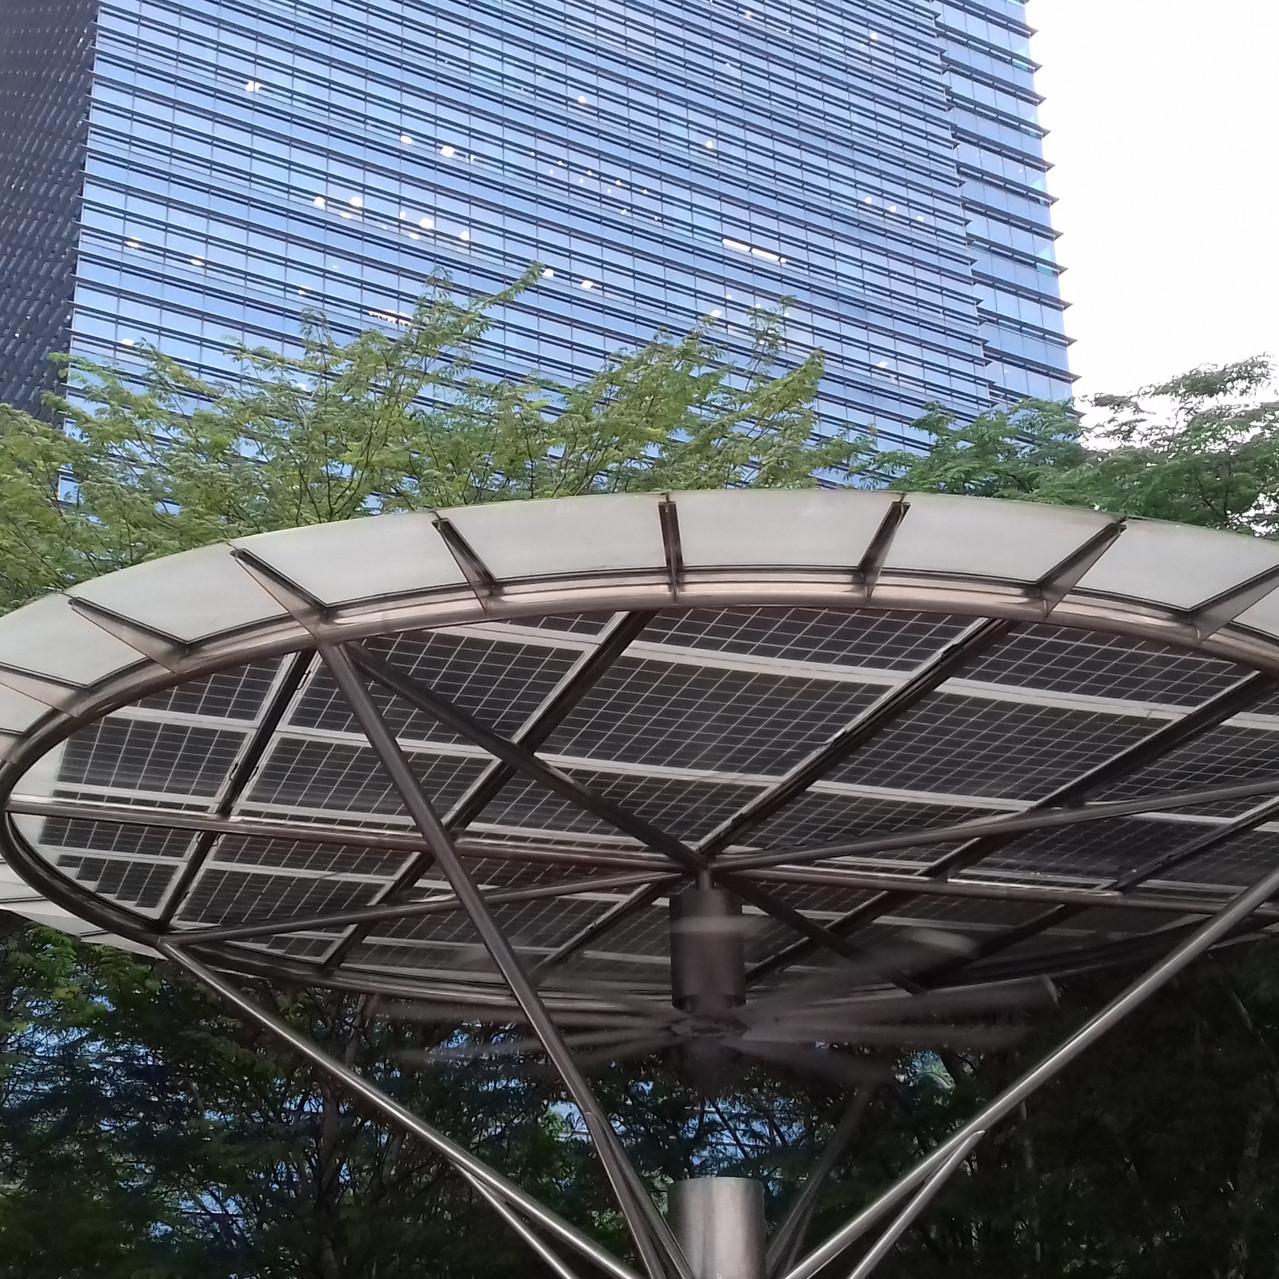 Eclairage photovoltaïqe